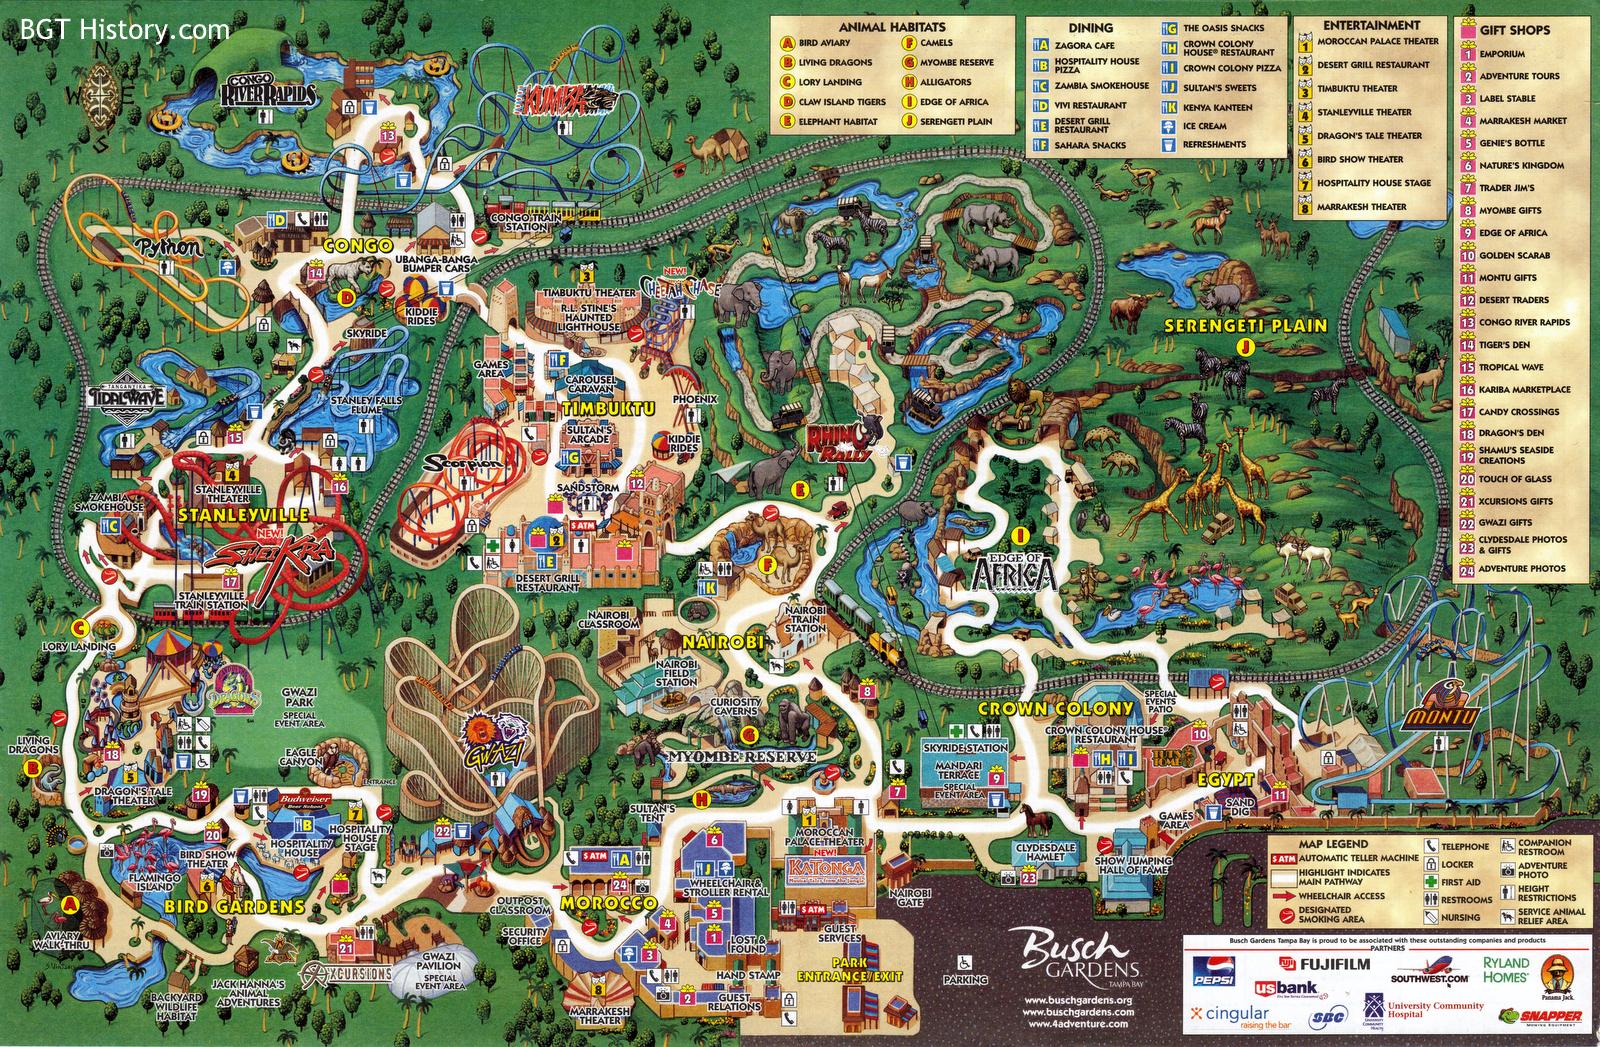 Maps - Bgt History - Busch Gardens Tampa History - Florida Busch Gardens Map